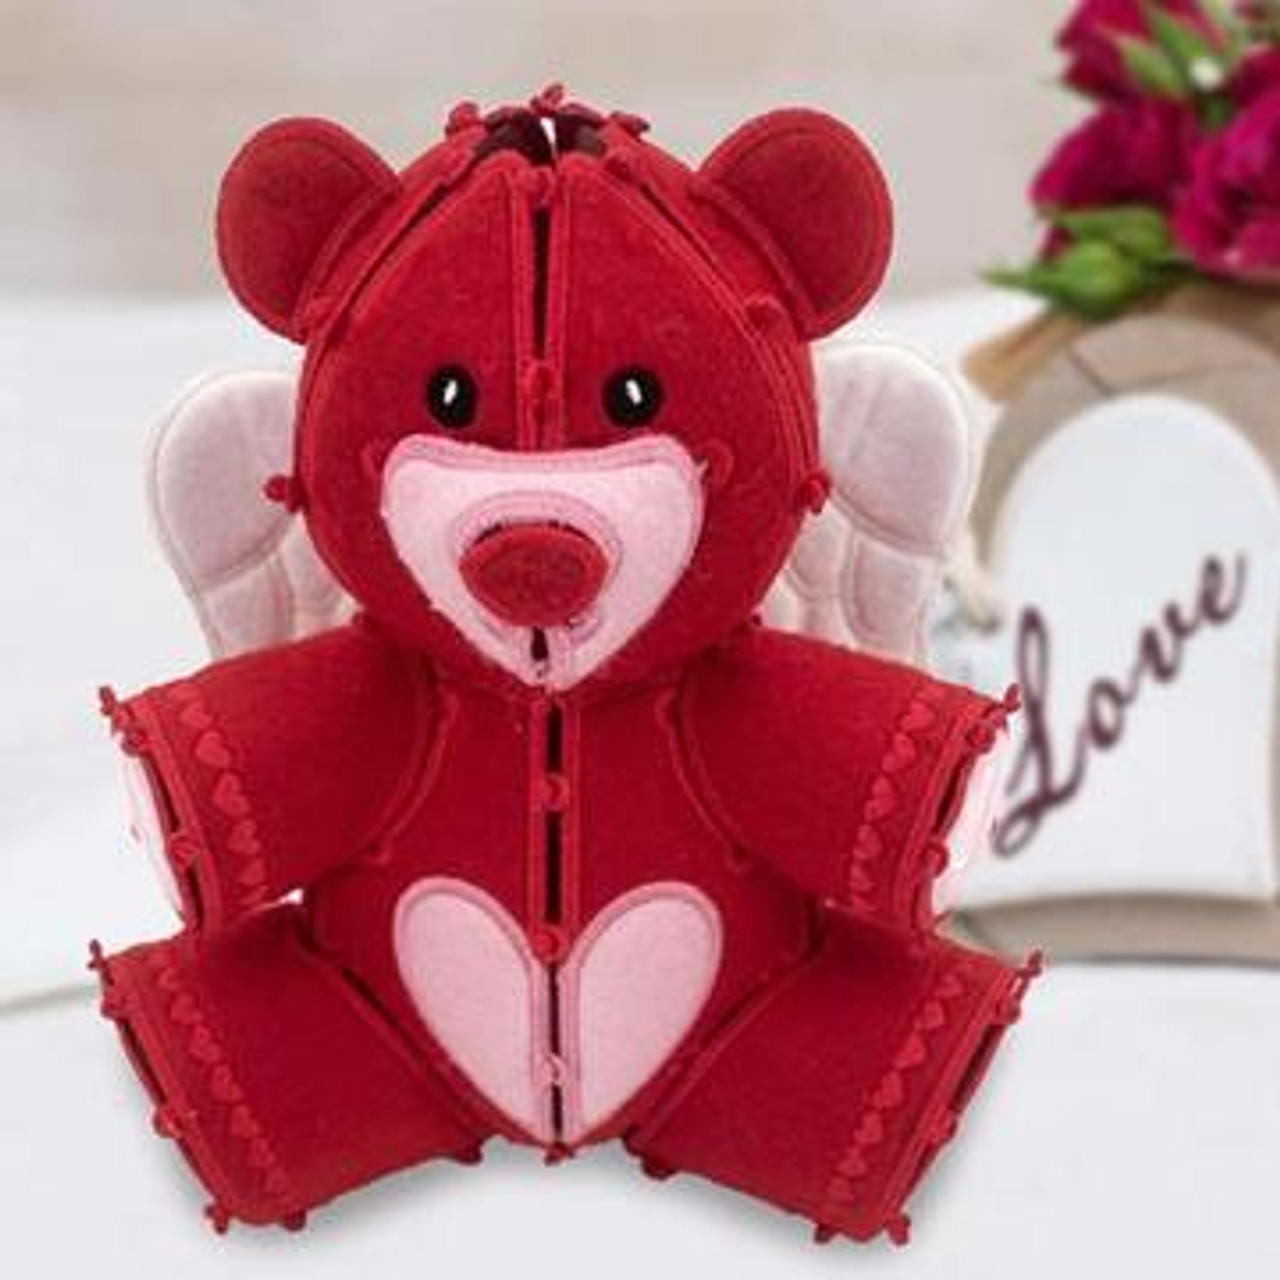 Freestanding Valentine Teddy Bear